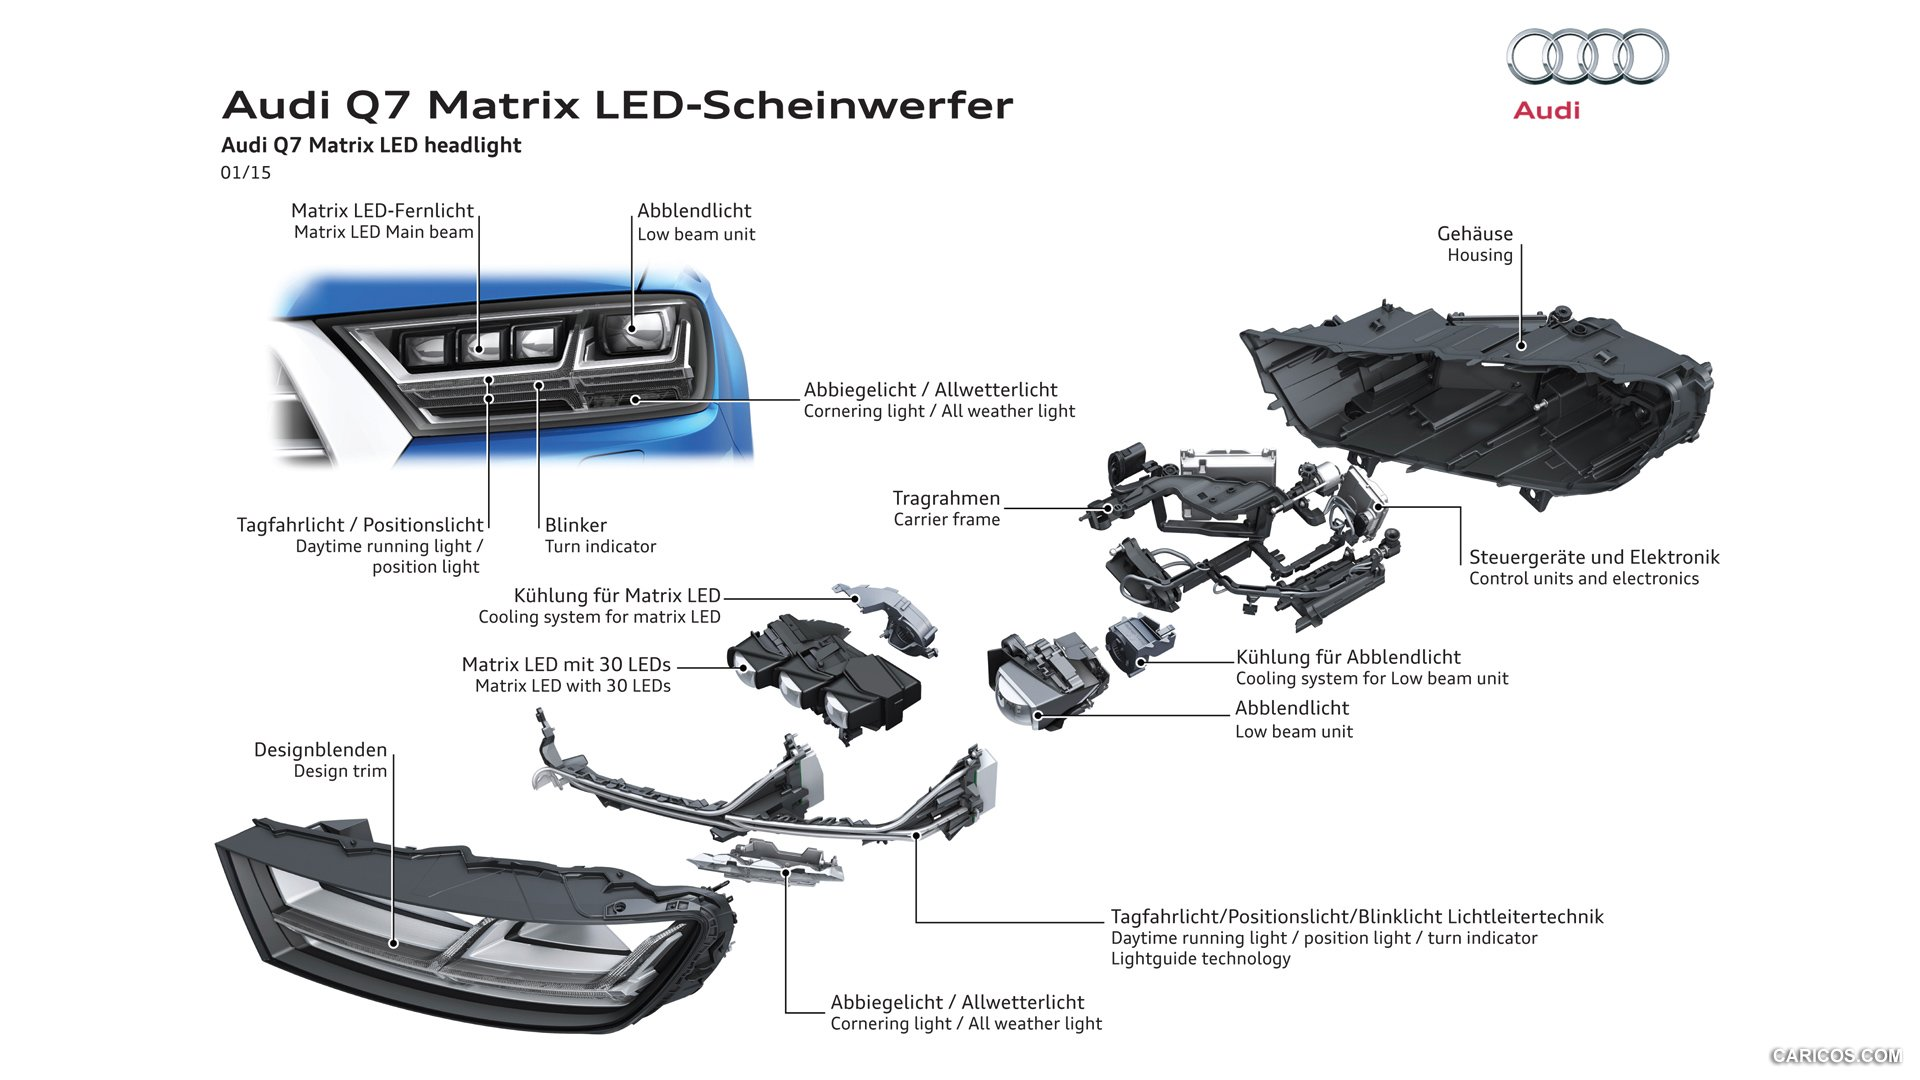 Facelift Led Vs Matrix Lights Audi Sport Net